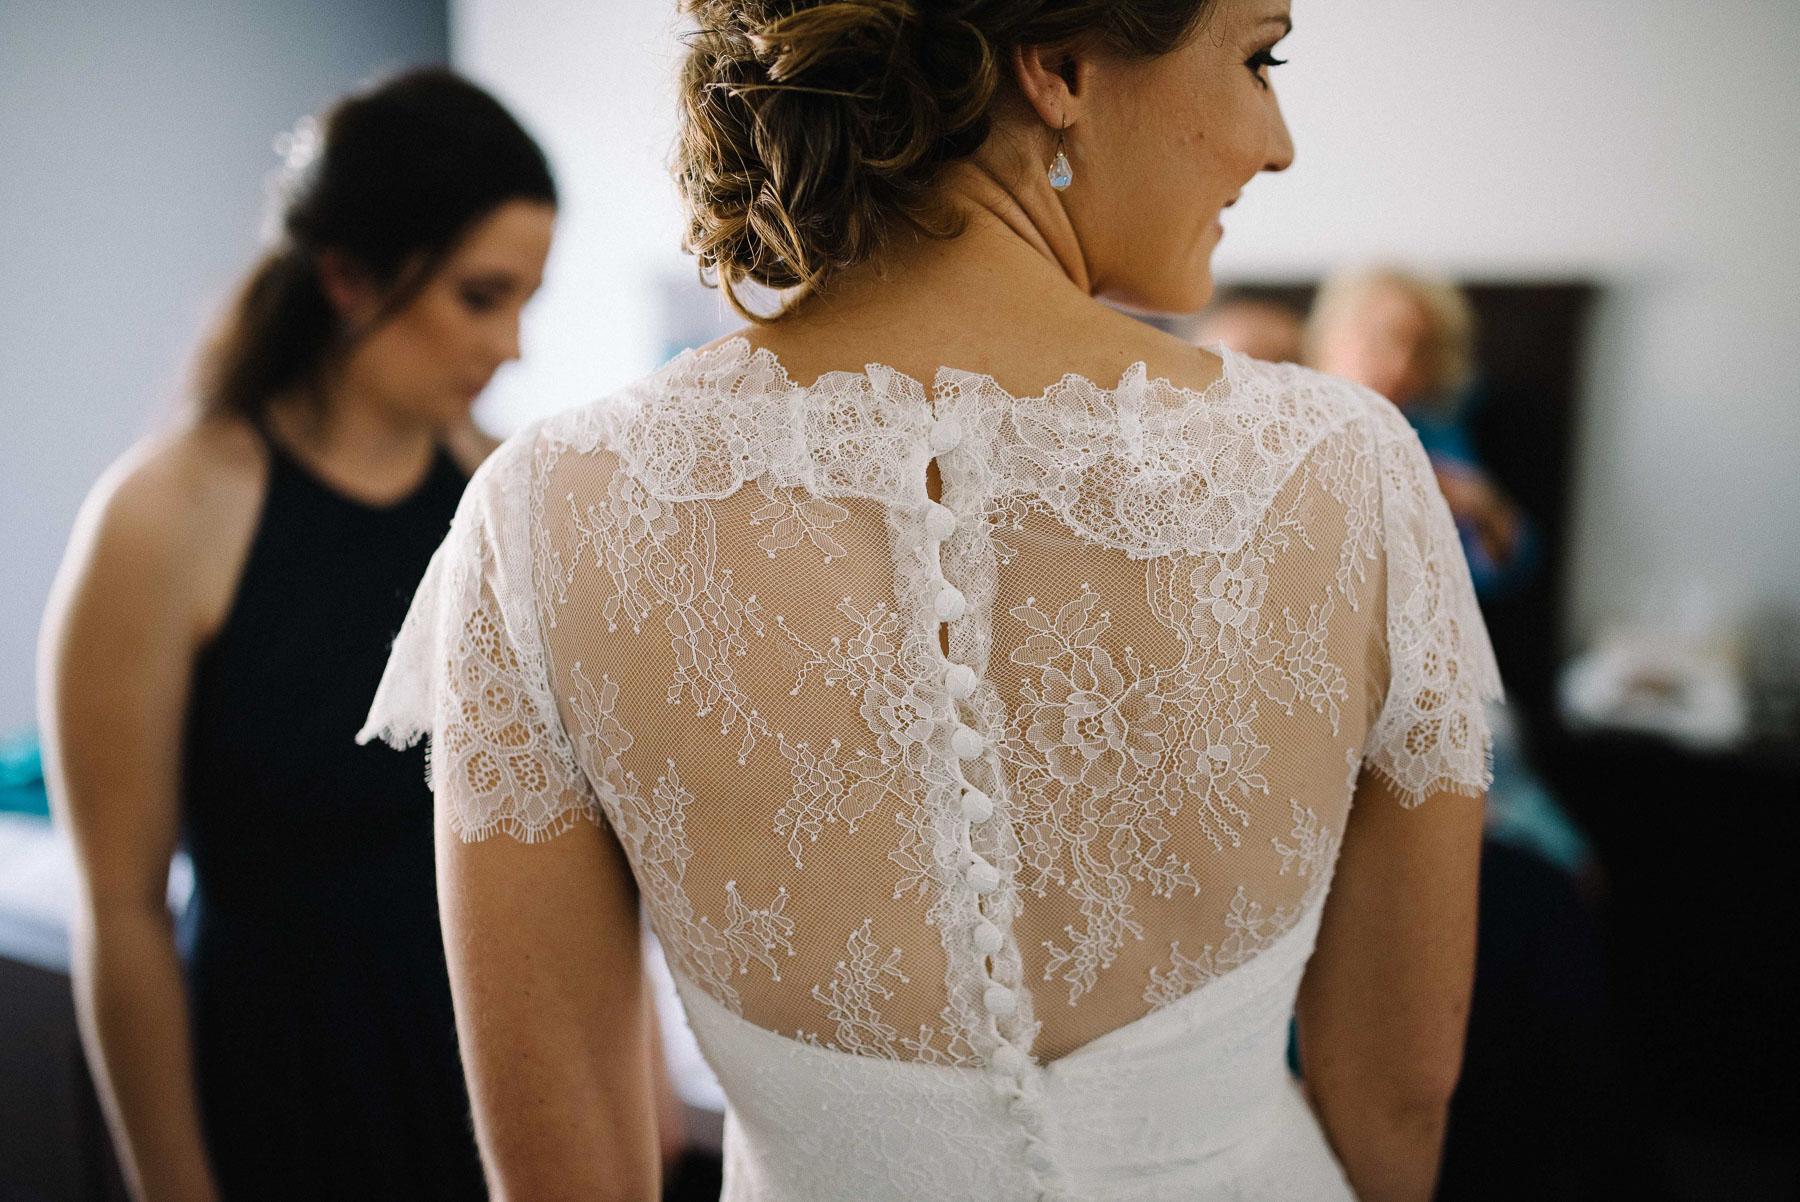 18-lace vintage wedding dress perth.jpg